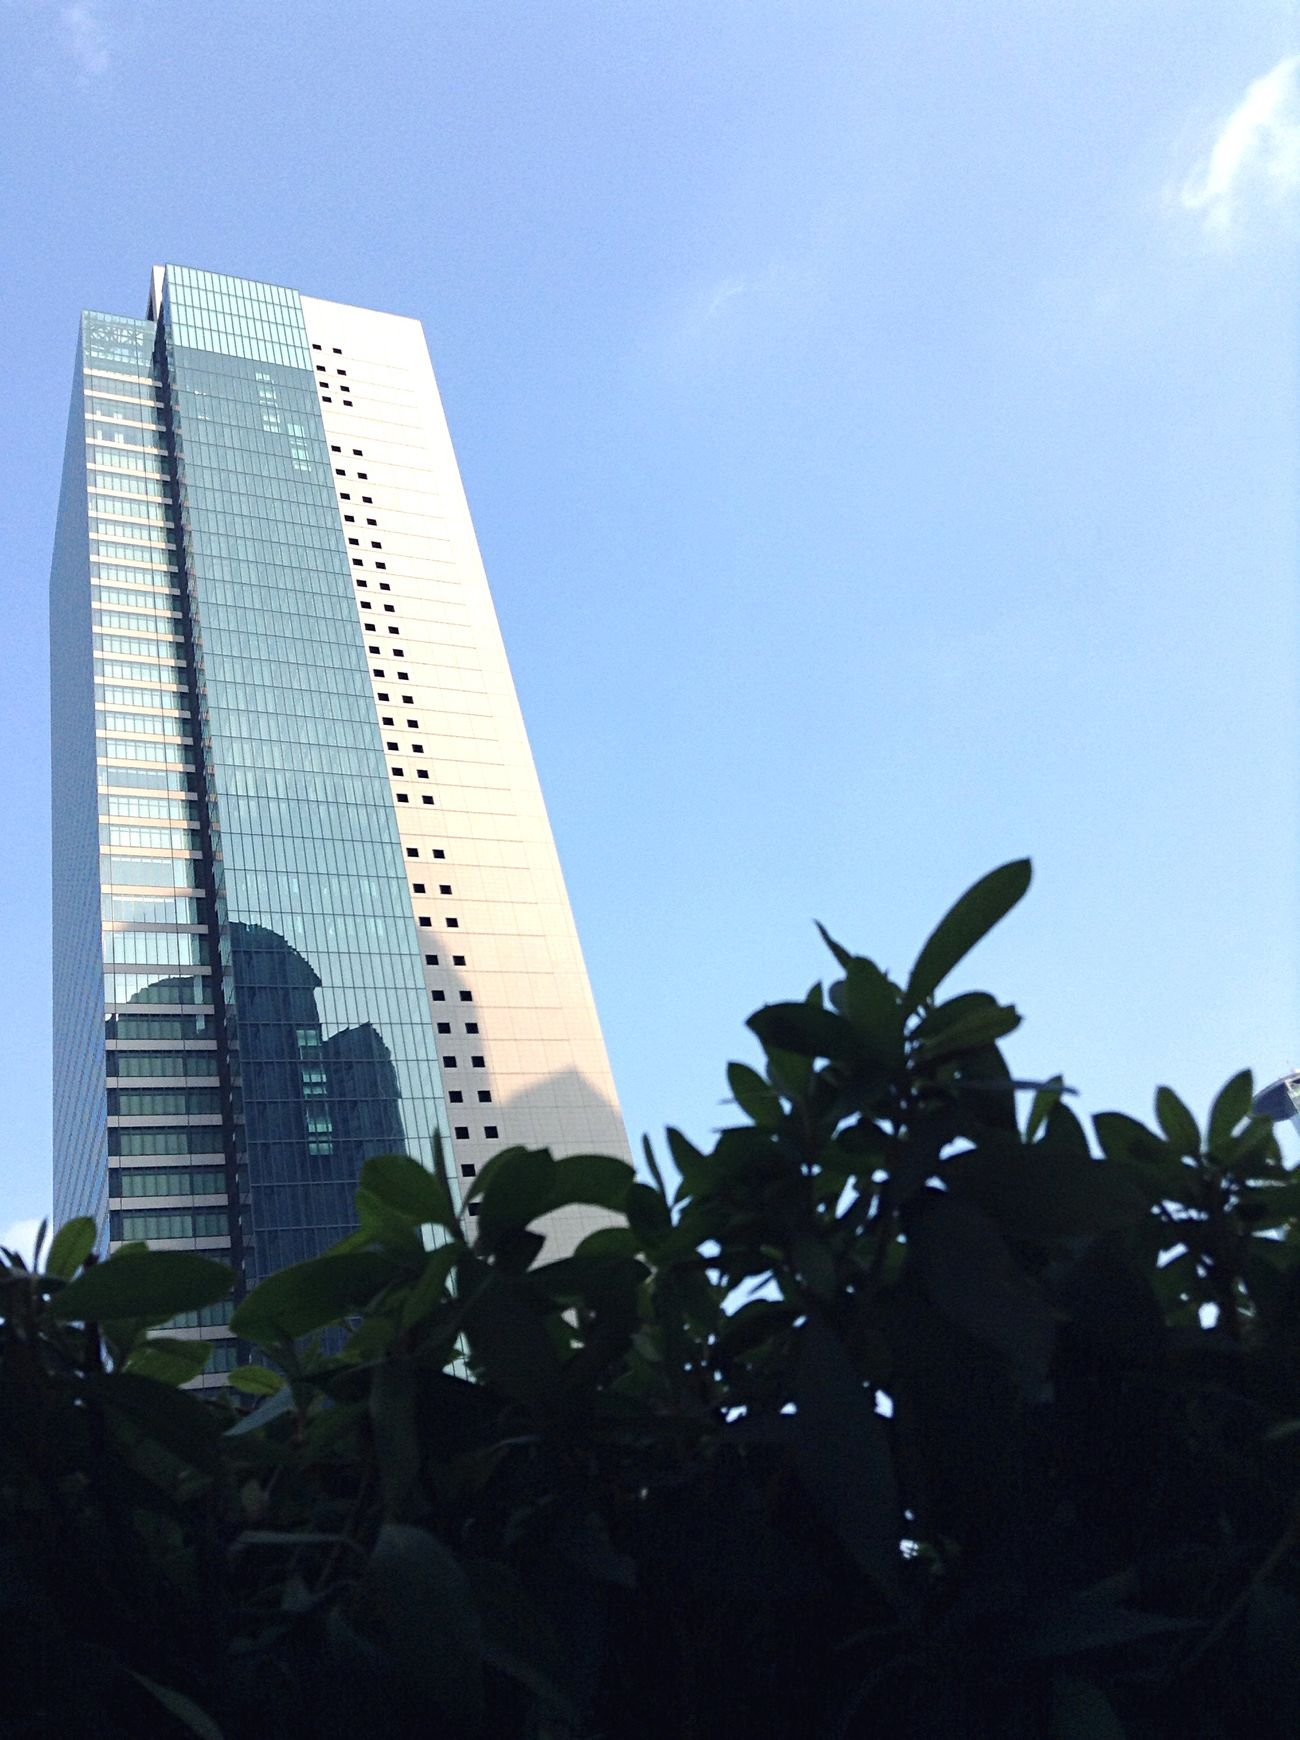 Summer Sky Blue 夏 空 青 青空 ビル